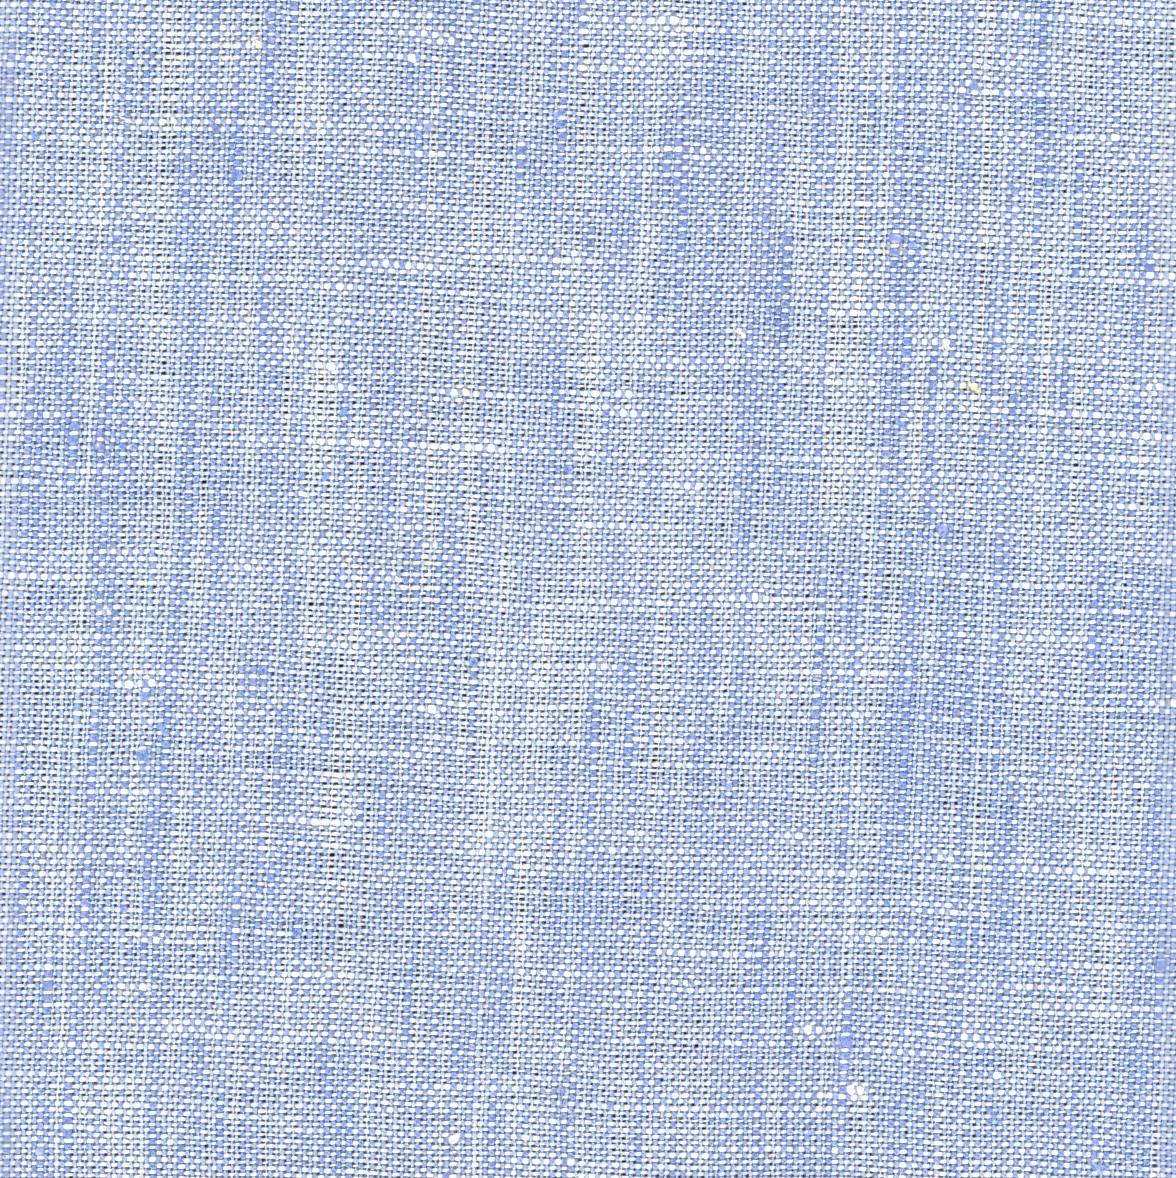 CERRO Light Blue/White